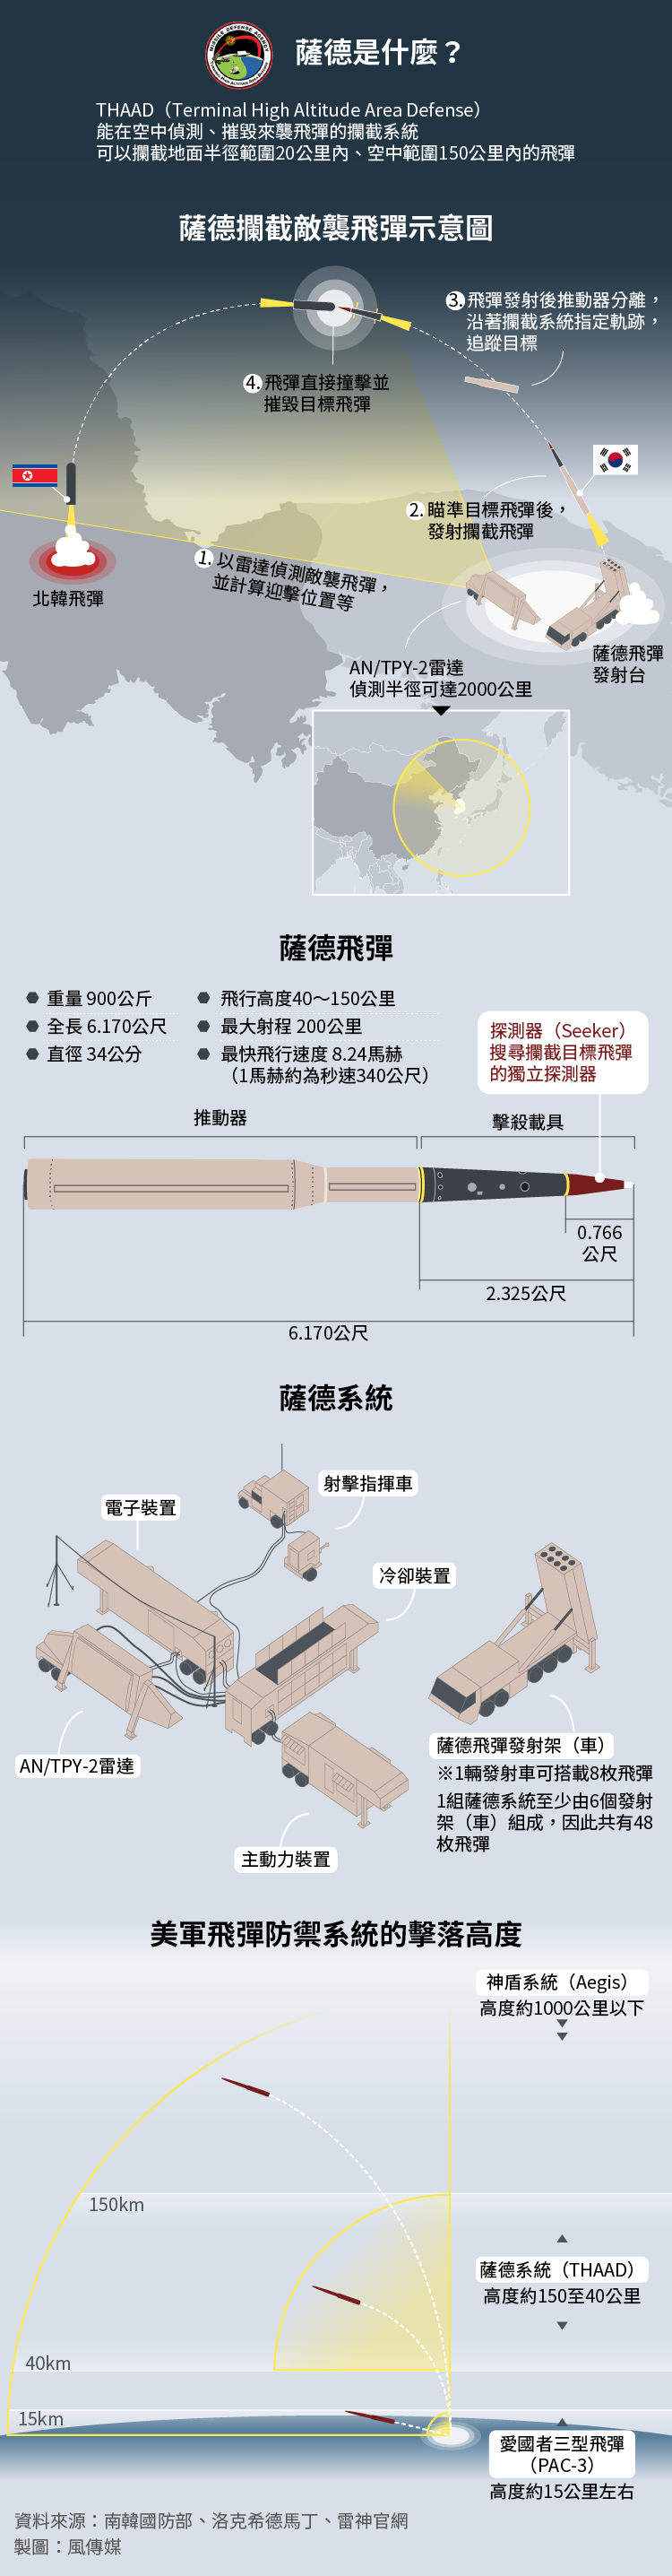 薩德反飛彈系統、THAAD